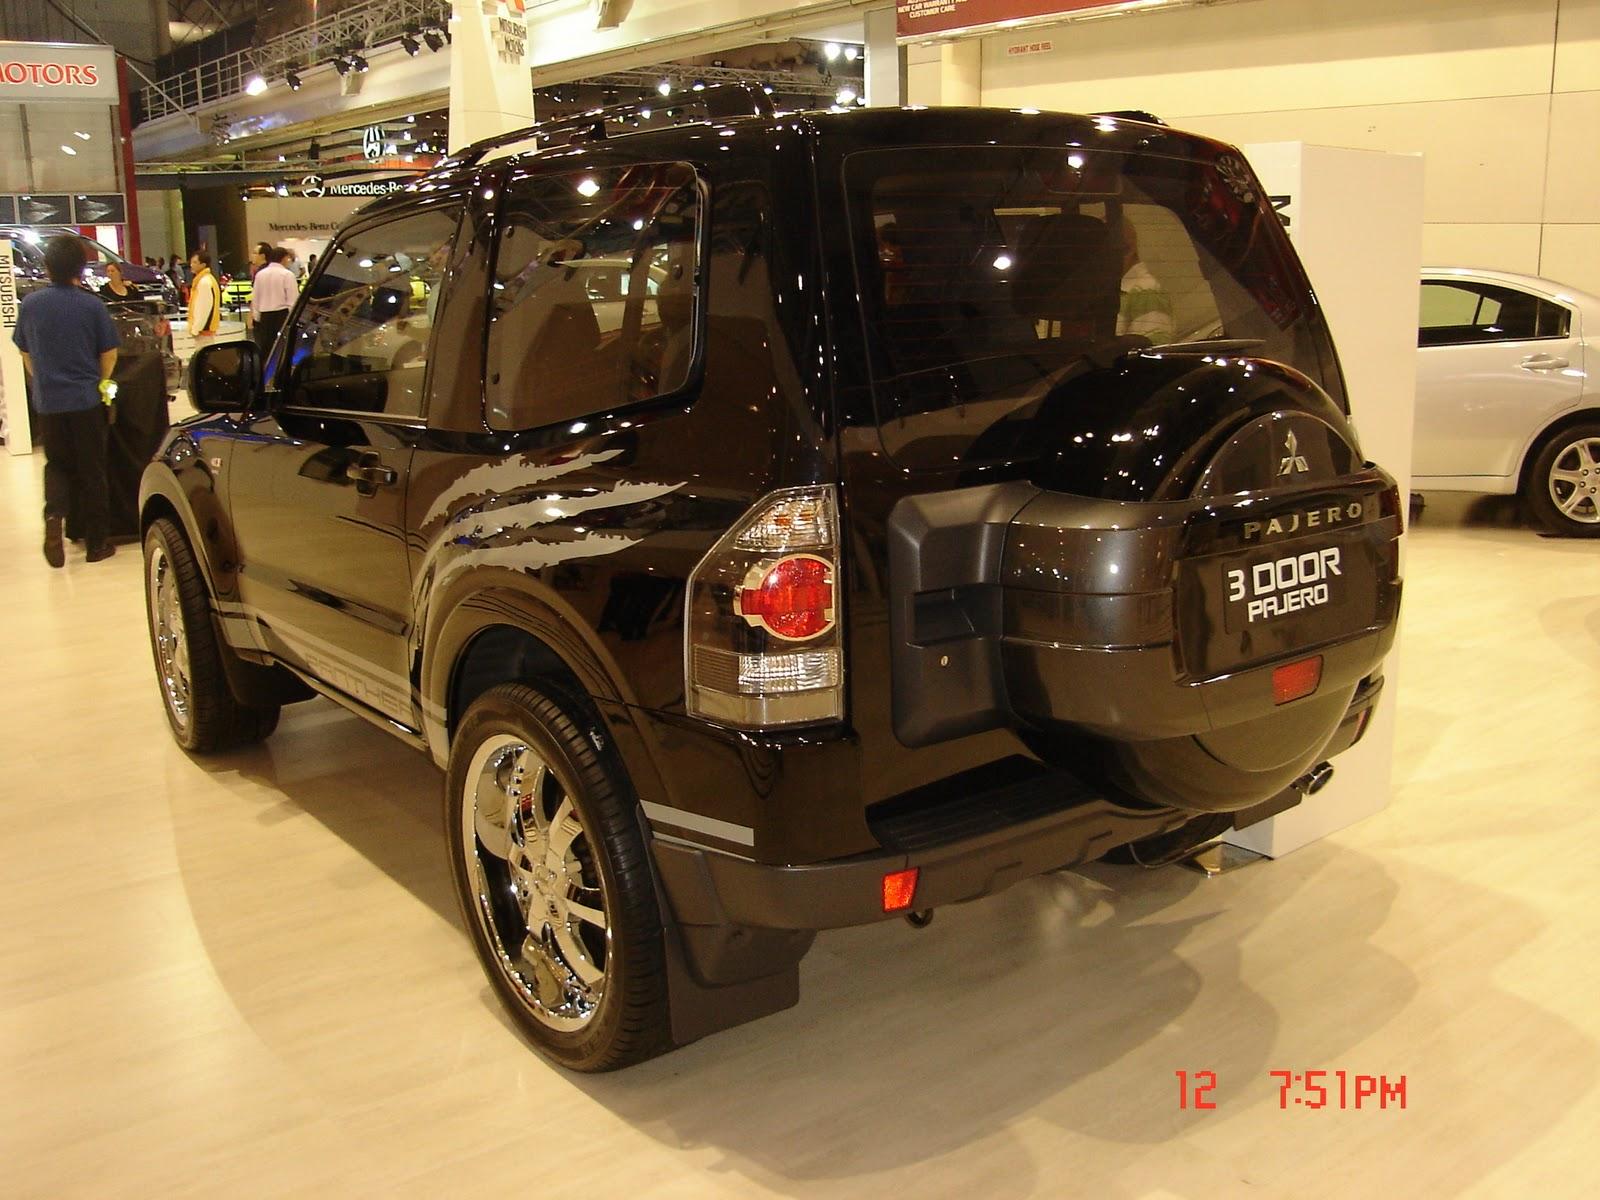 http://1.bp.blogspot.com/_rqqtSGINUiY/TPfEtt5HVmI/AAAAAAAAAHY/a9kKHjSn39k/s1600/mitsubishi-pajero+car+image.jpg